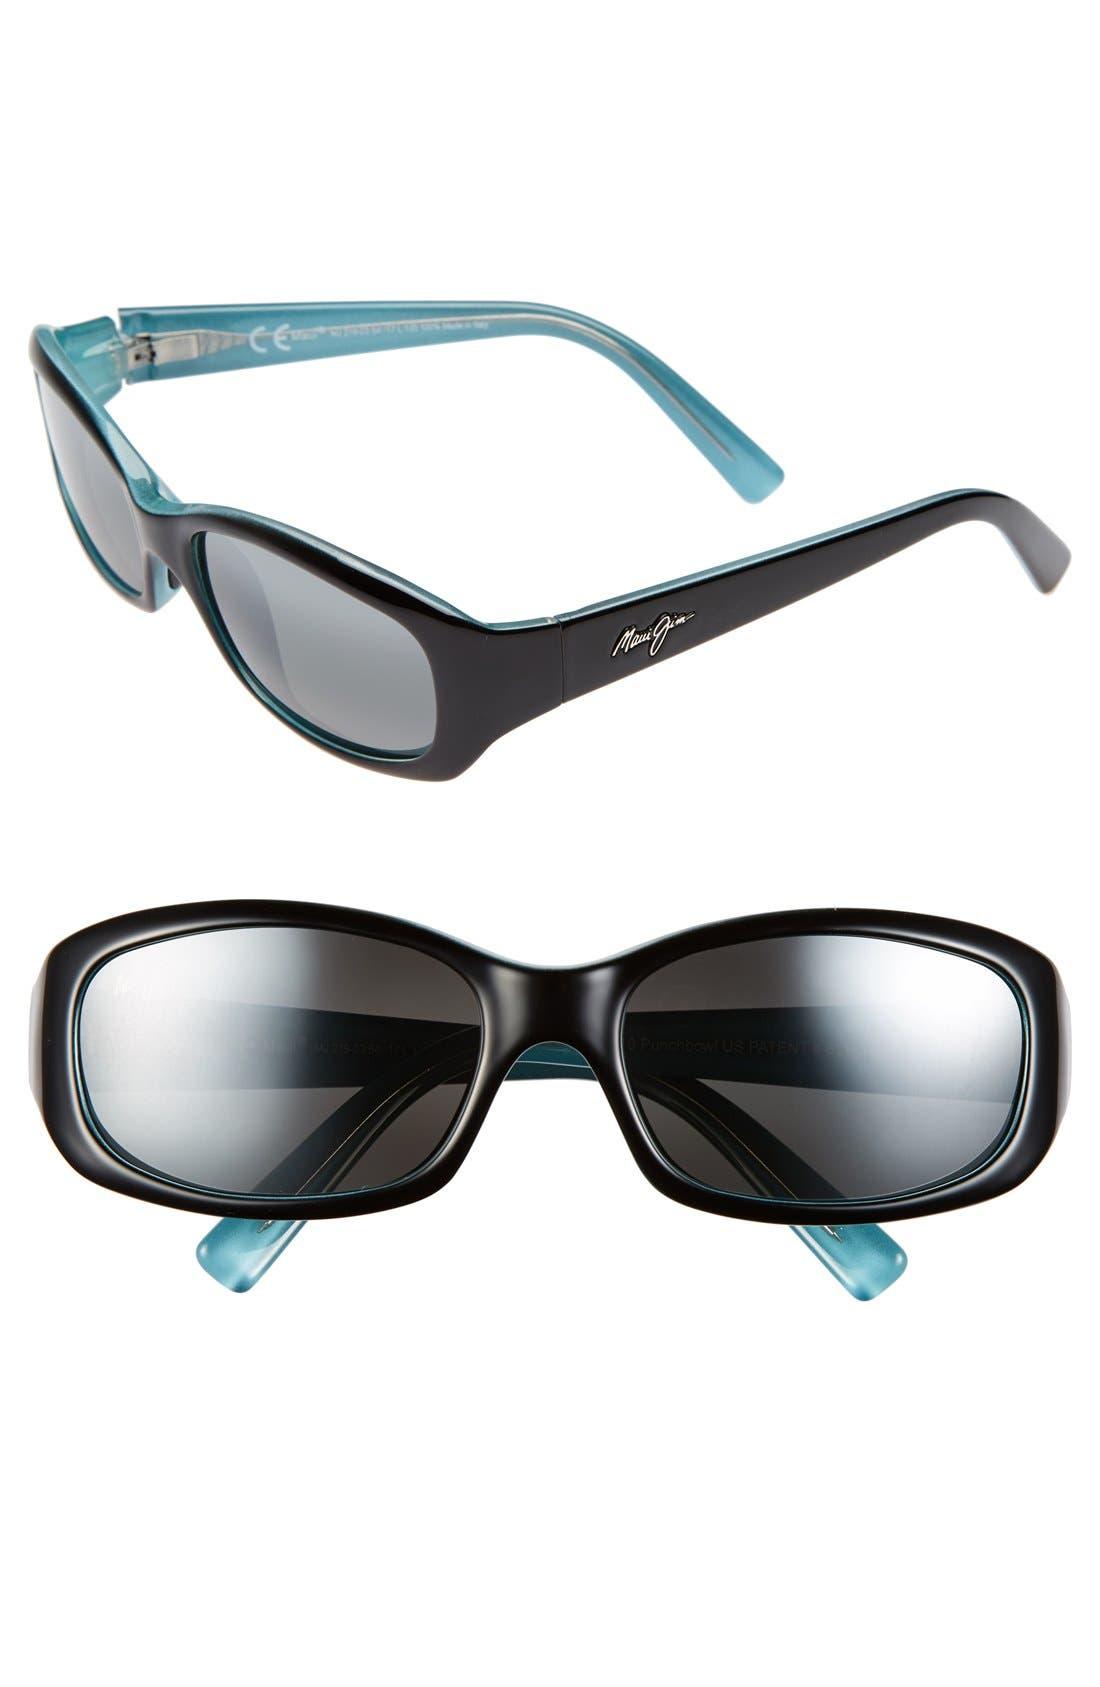 Punchbowl 54mm PolarizedPlus2<sup>®</sup> Rectangular Sunglasses,                             Main thumbnail 1, color,                             BLACK W/ BLUE